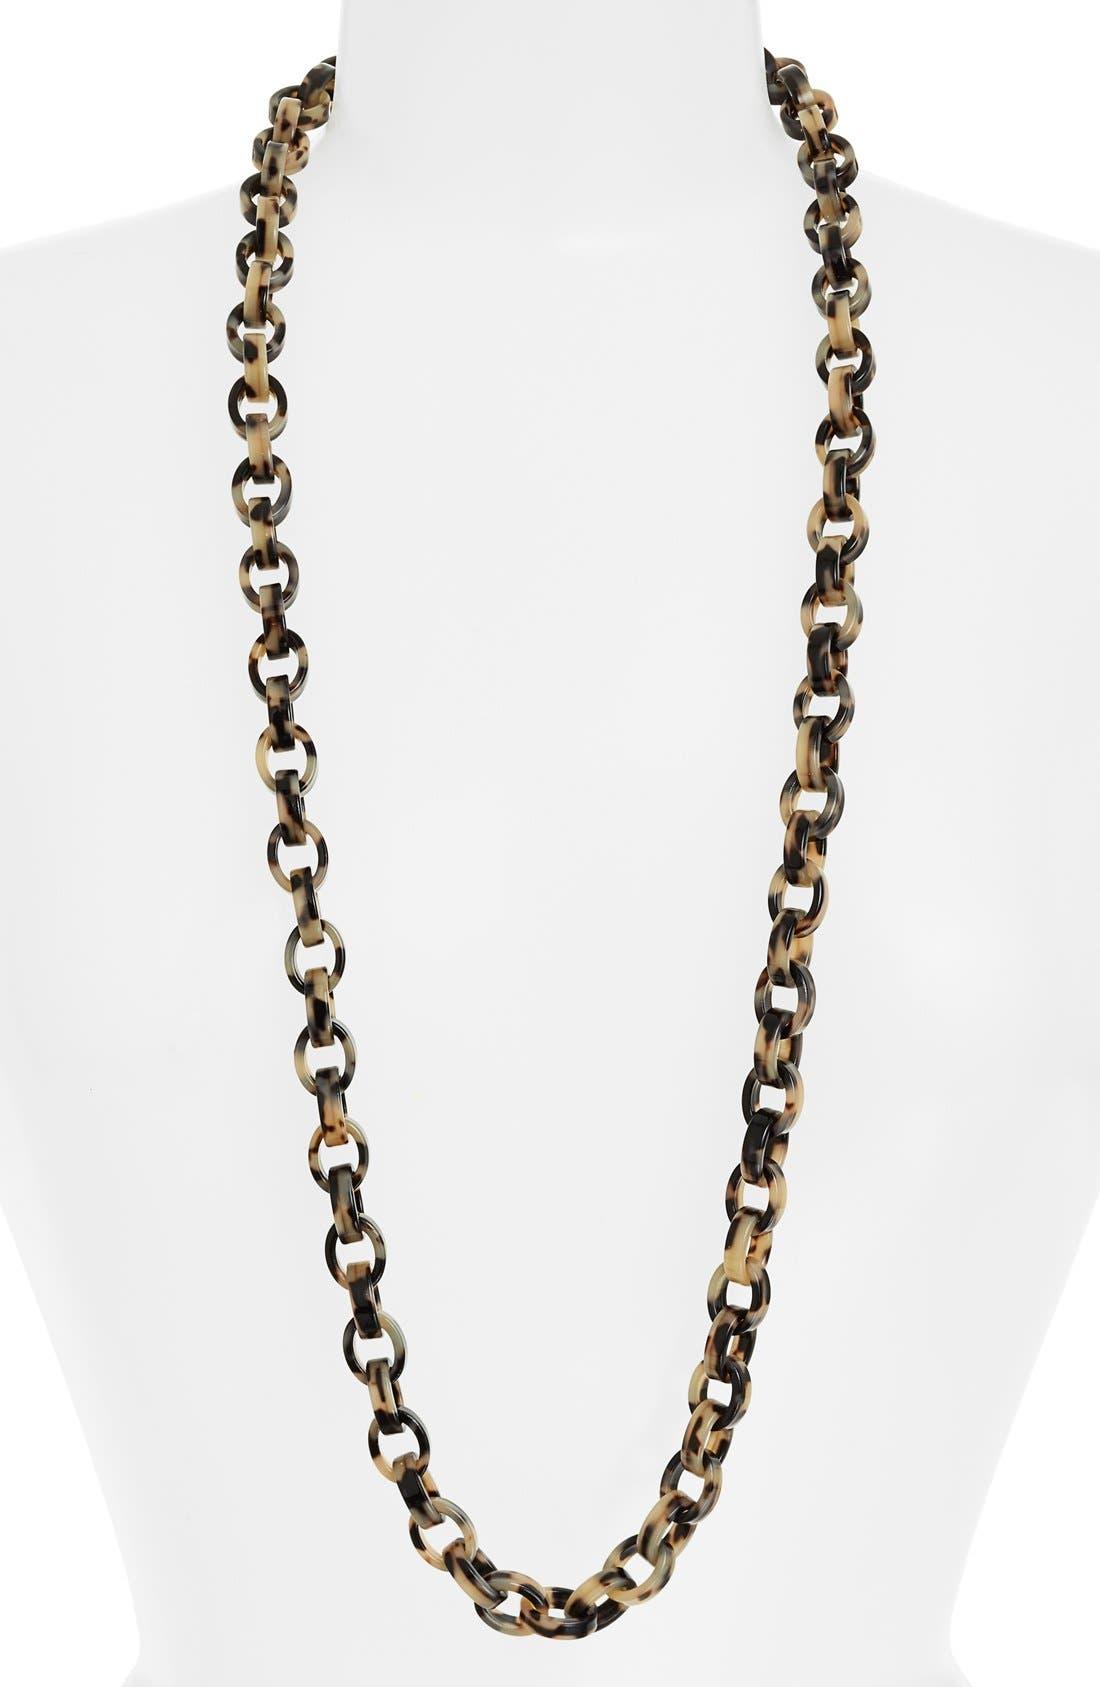 L. ERICKSON 'Sophie' Link Necklace